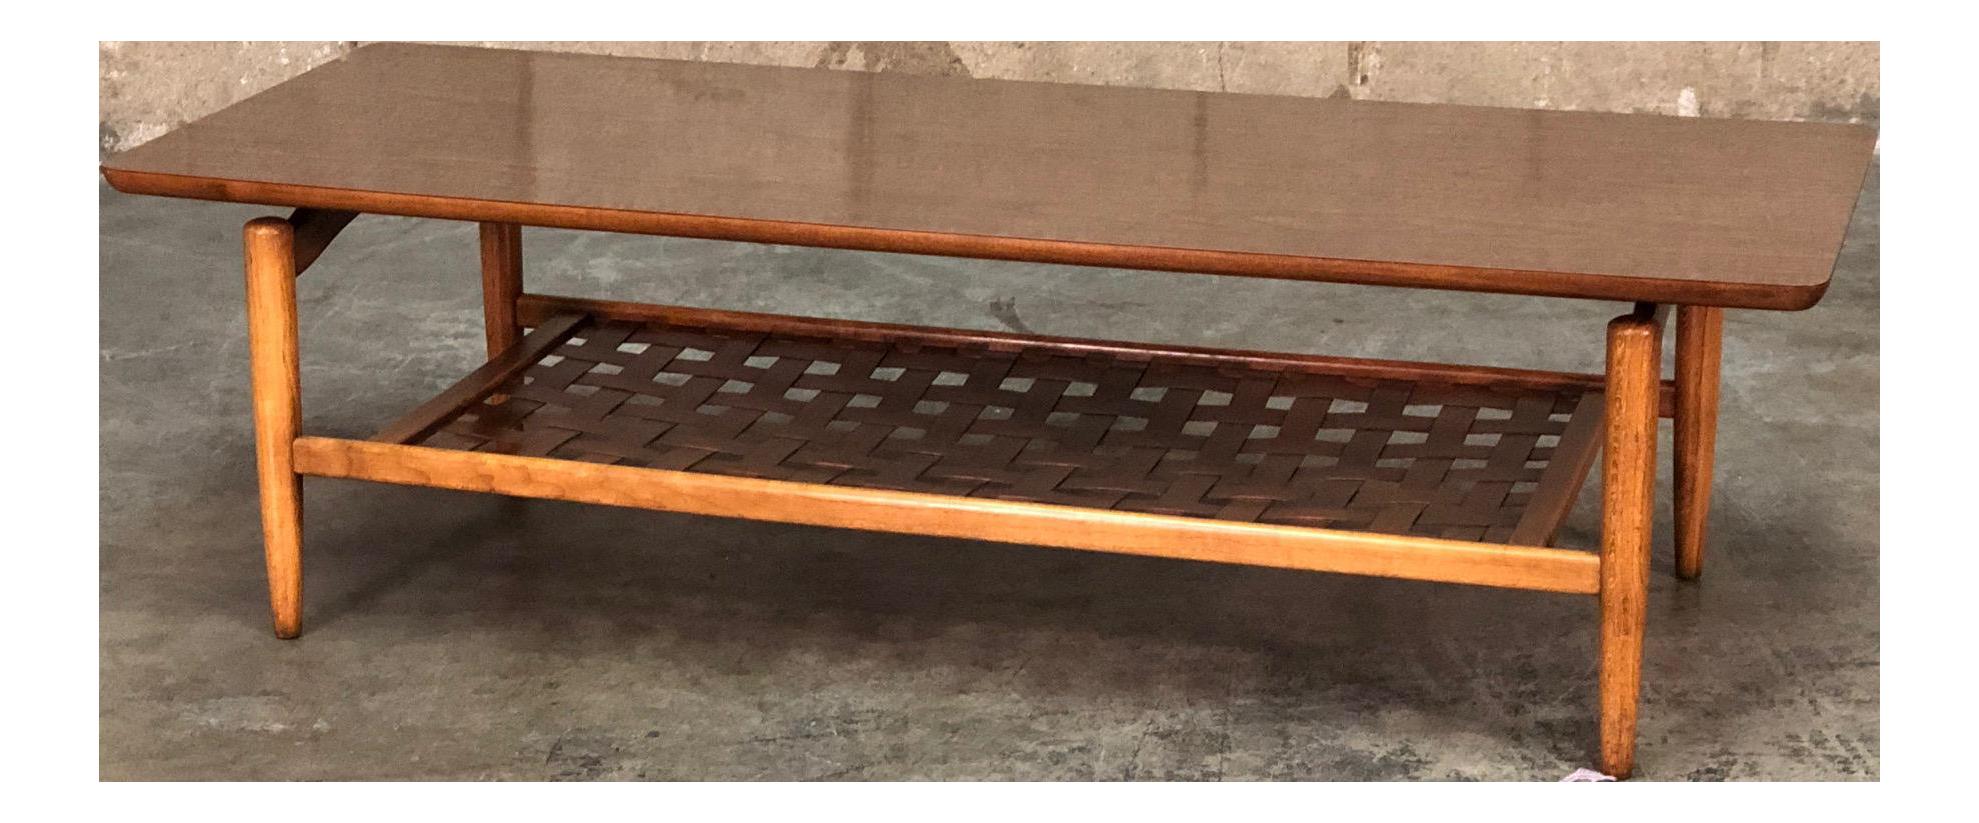 Lane MidCentury Modern Coffee Table Floating Top Design Chairish